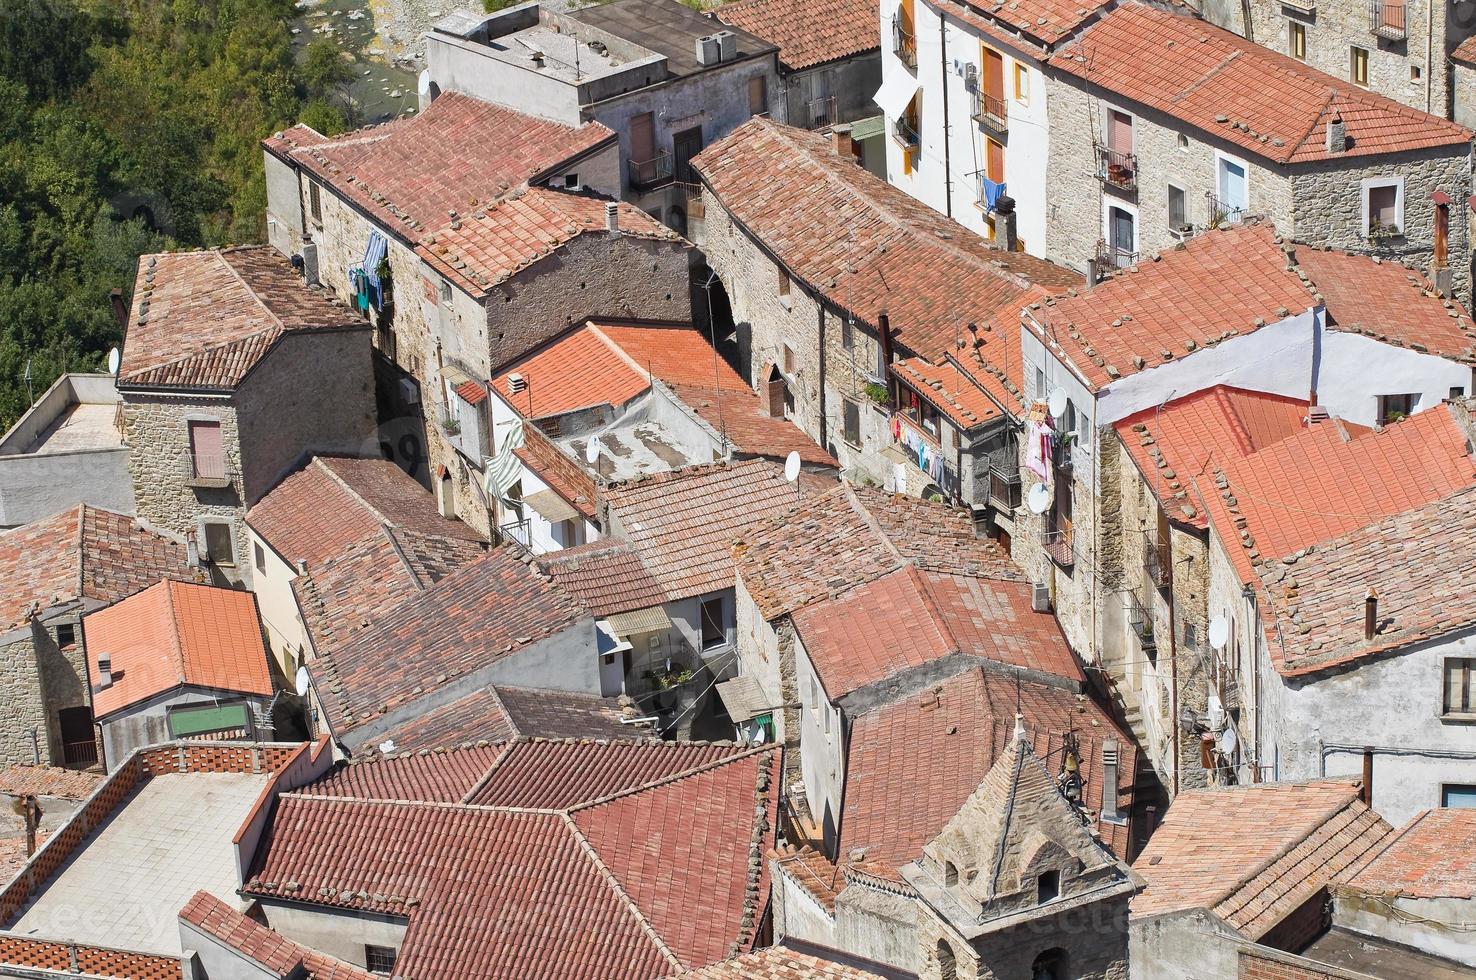 vista panorâmica de valsinni. basilicata. Itália. foto